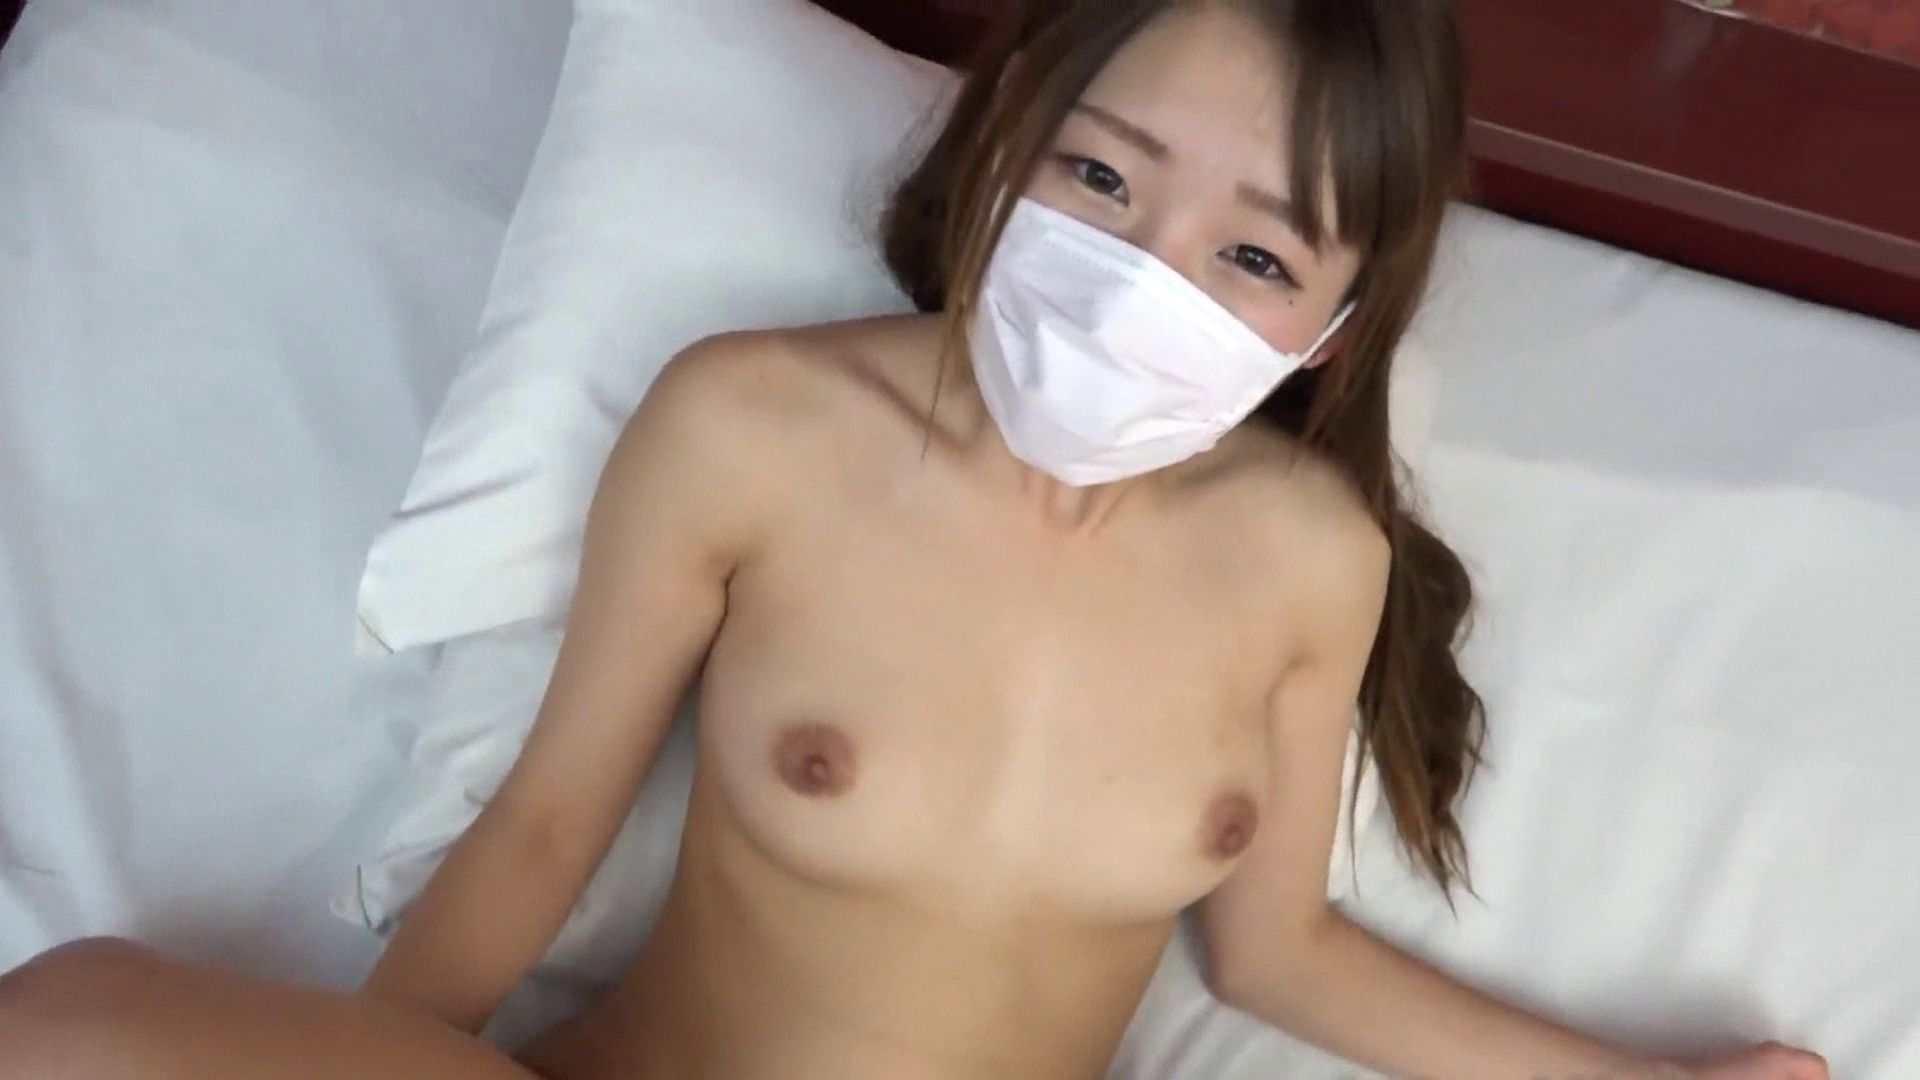 S級厳選美女ビッチガールVol.40 後編 エッチなセックス  57画像 51